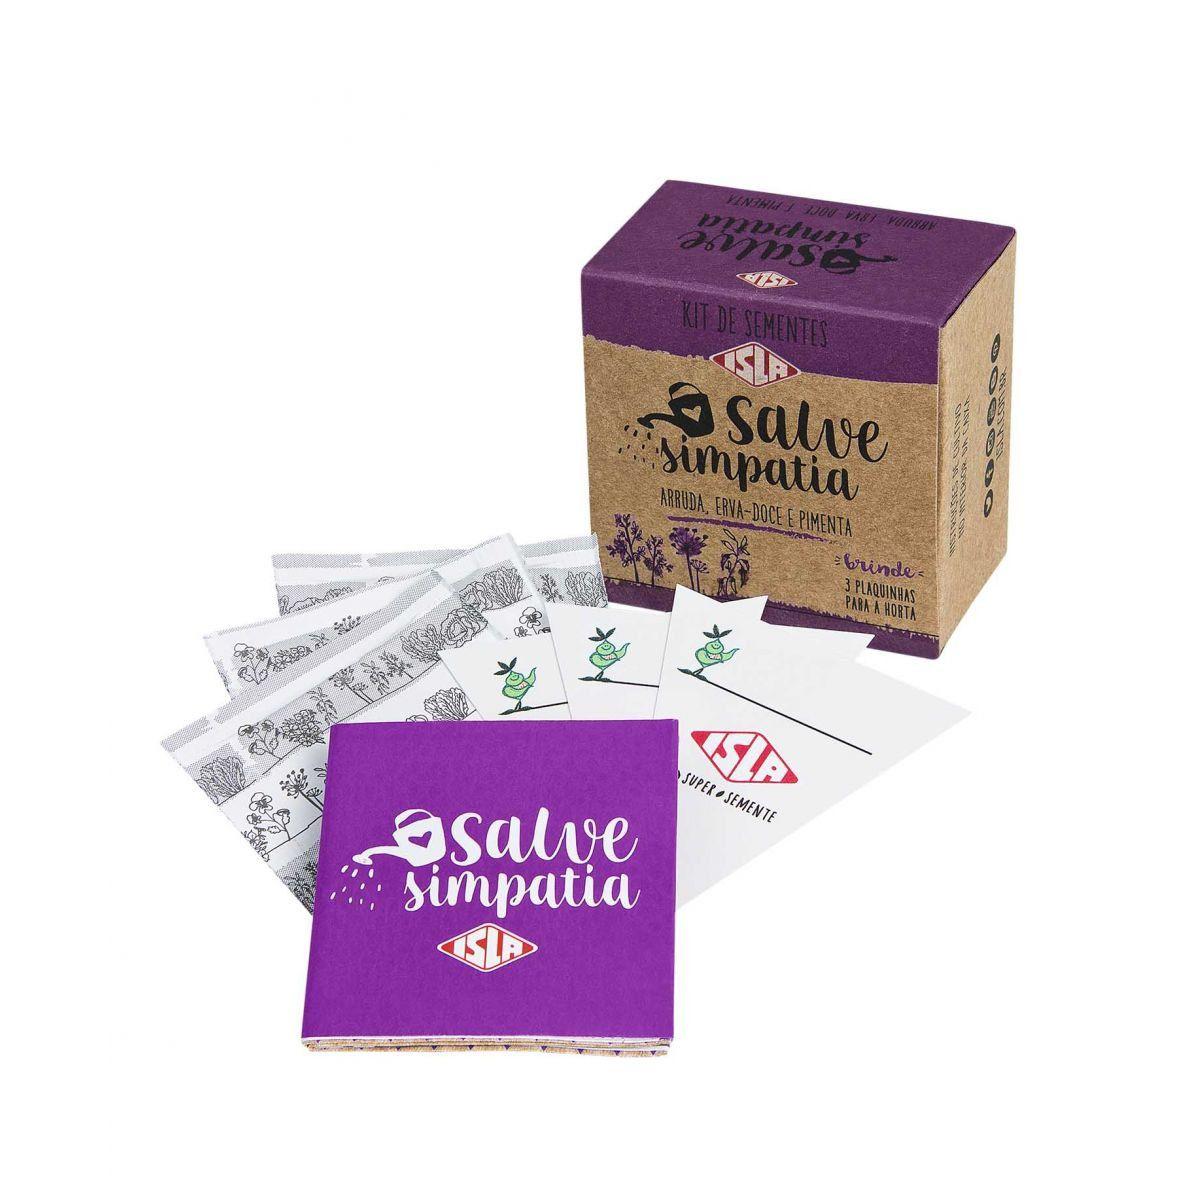 "Kit de Sementes ""Salve Simpatia"" (Arruda, Erva Doce e Pimenta)"